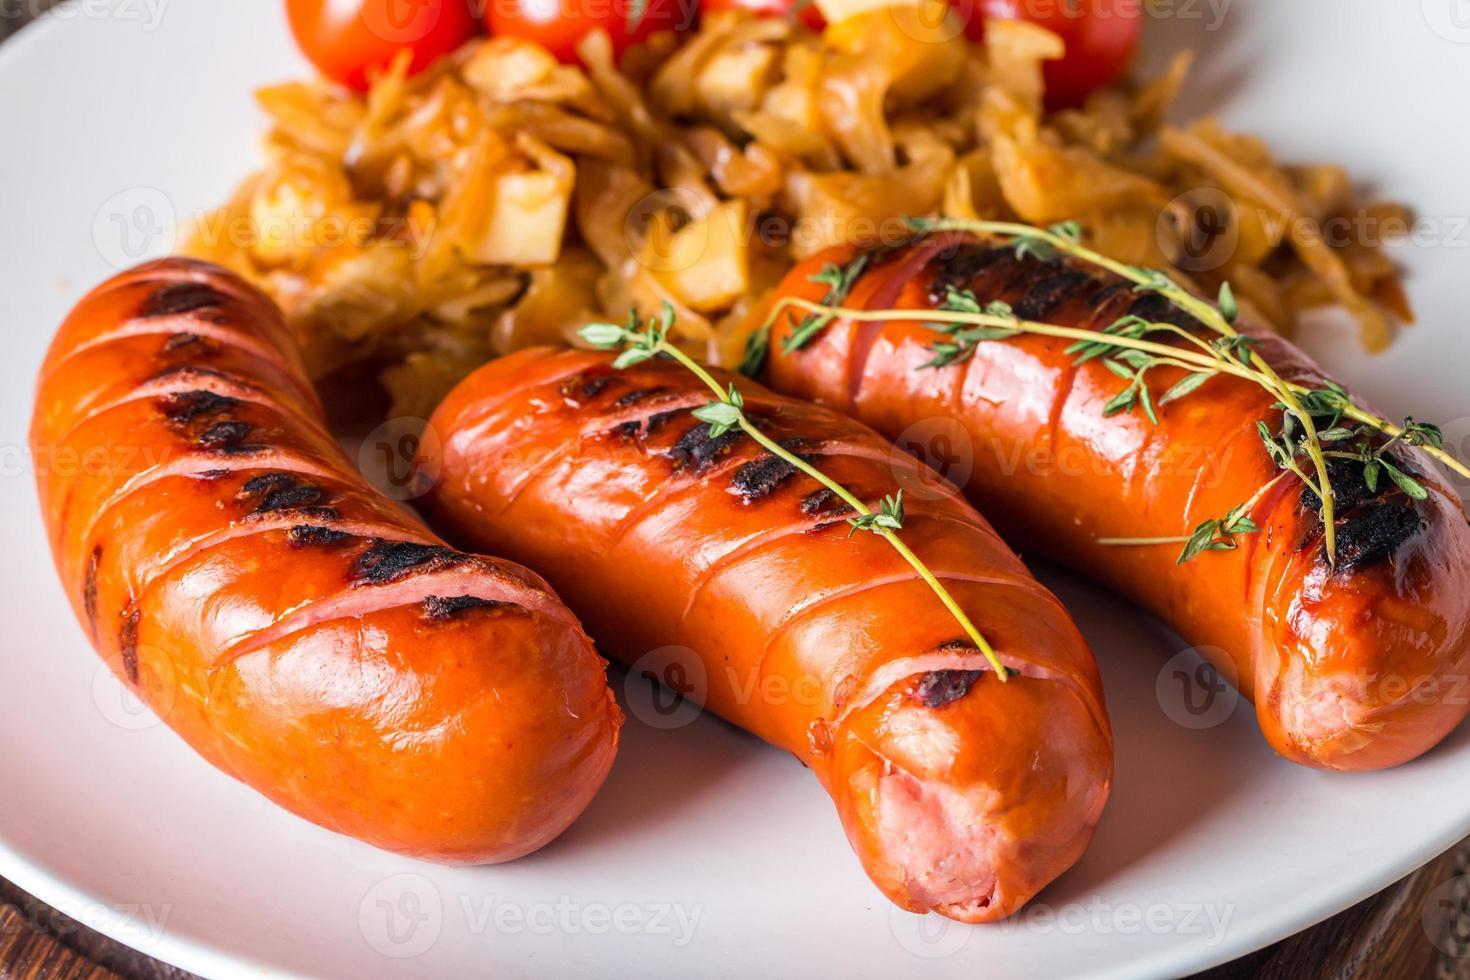 Grillwürste mit Kohl, Tomate foto